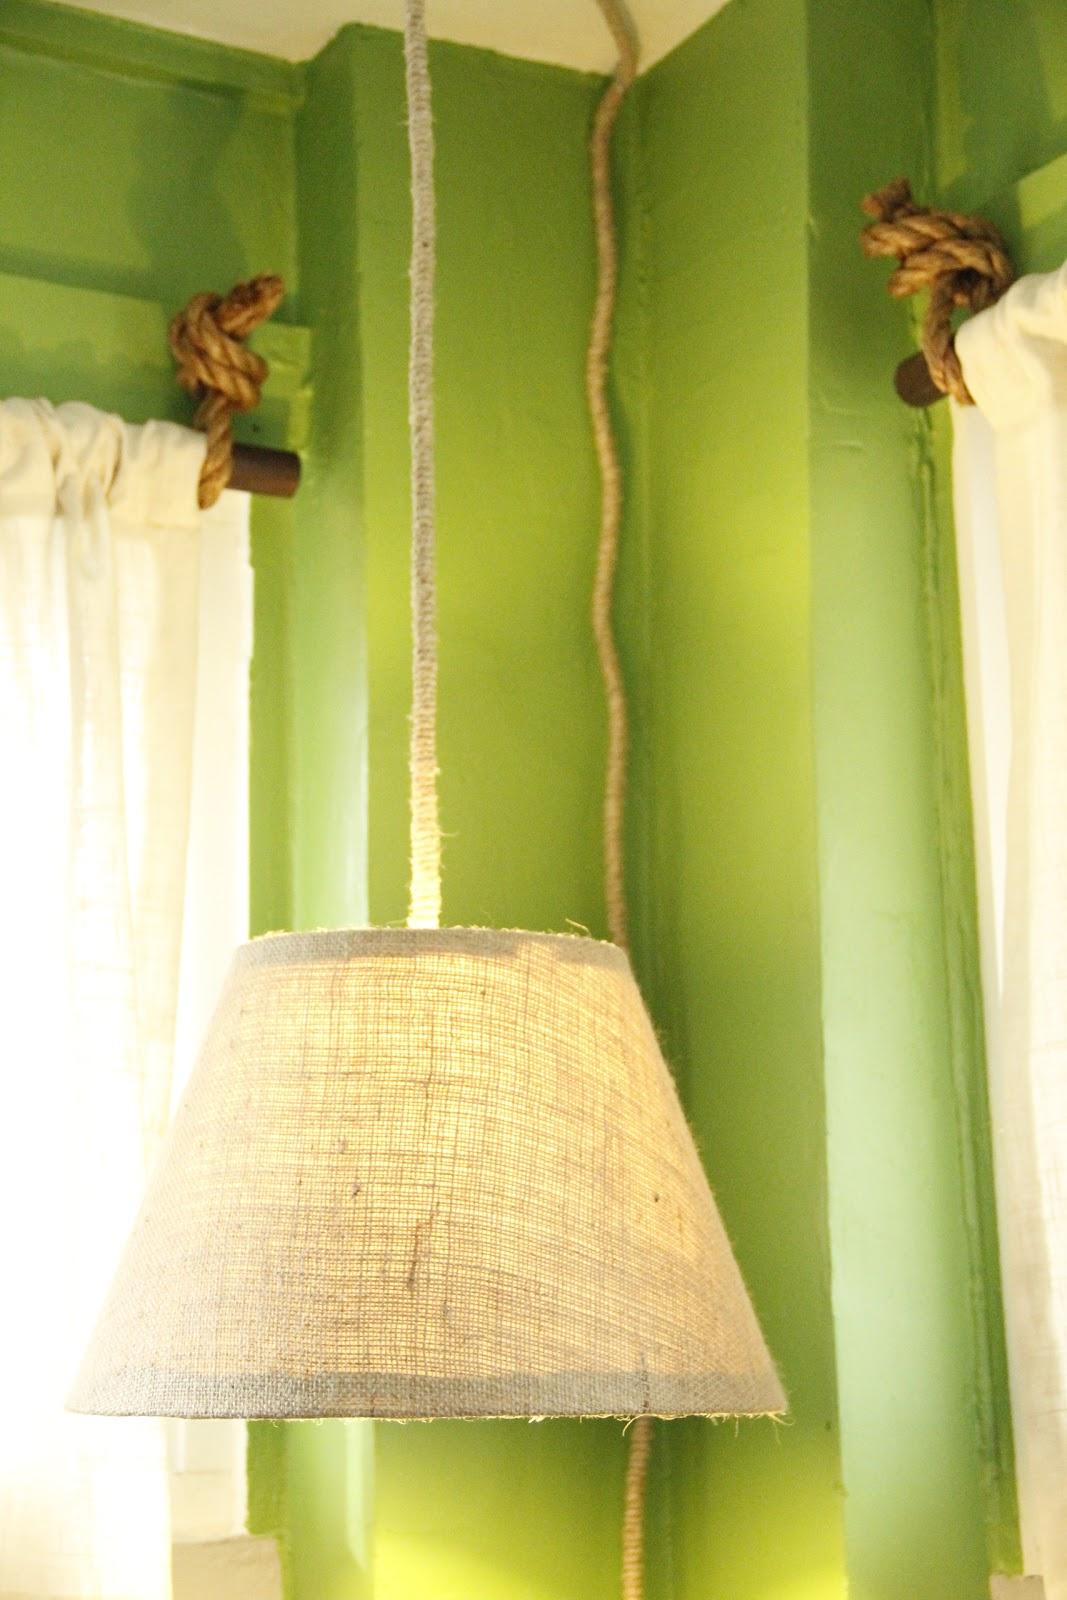 Hanging Pendant Lamp/ DIY Covering a Lampshade